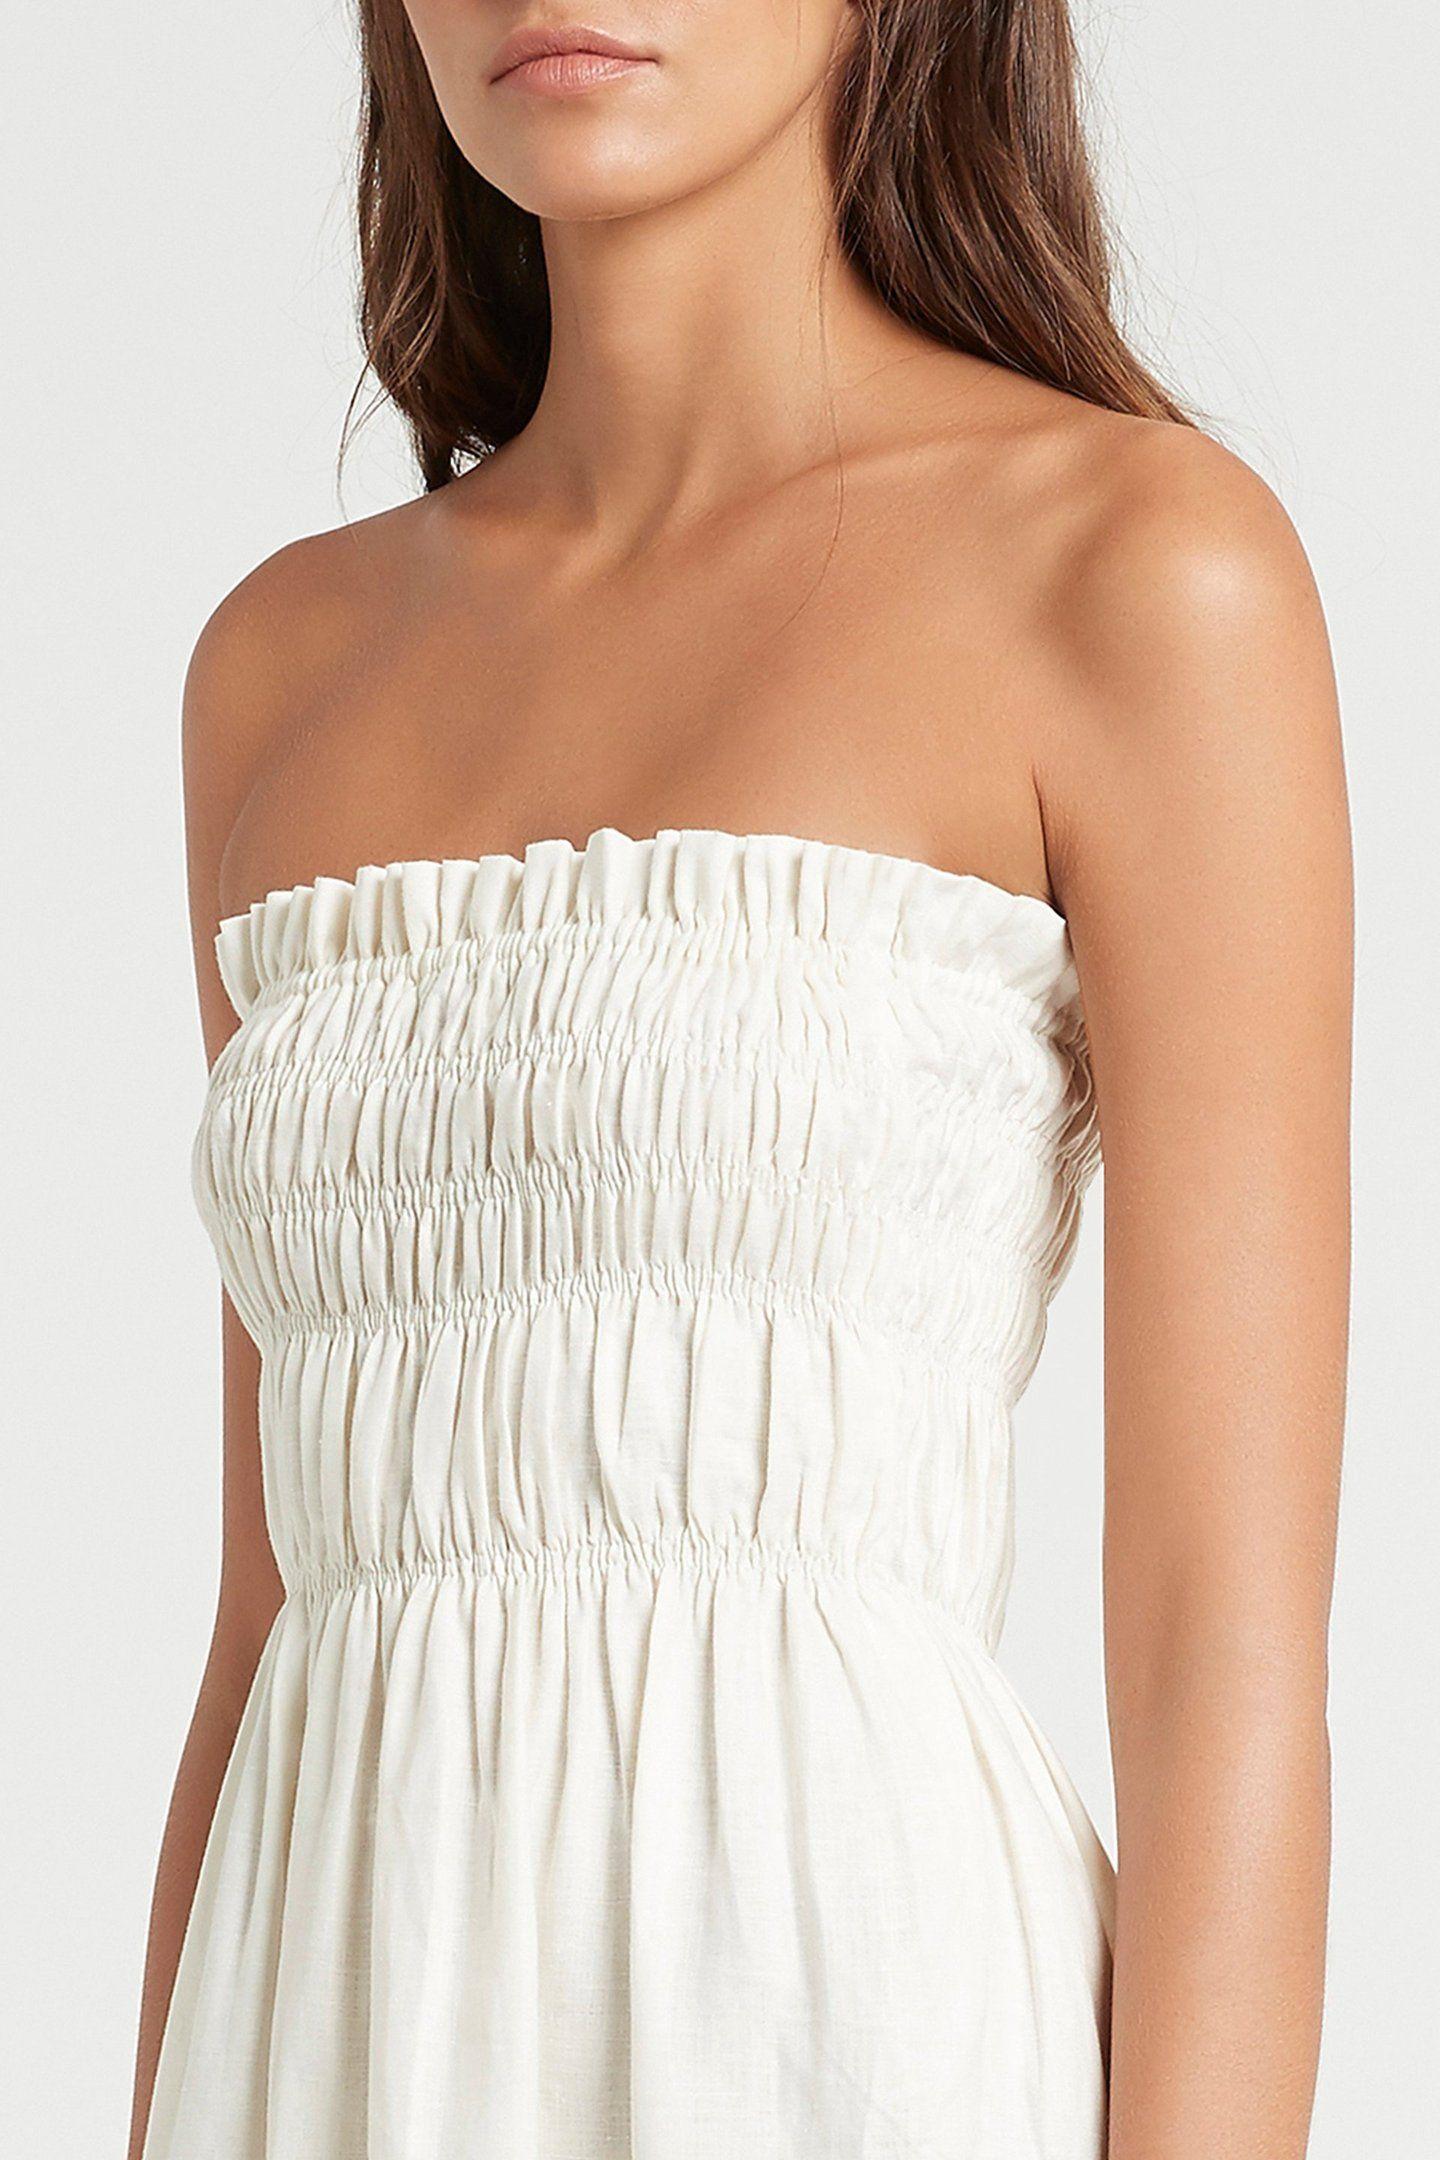 Alena Strapless Maxi Dress In 2021 Strapless Maxi Dress Strapless Summer Dress Strapless Top Outfit [ 2160 x 1440 Pixel ]